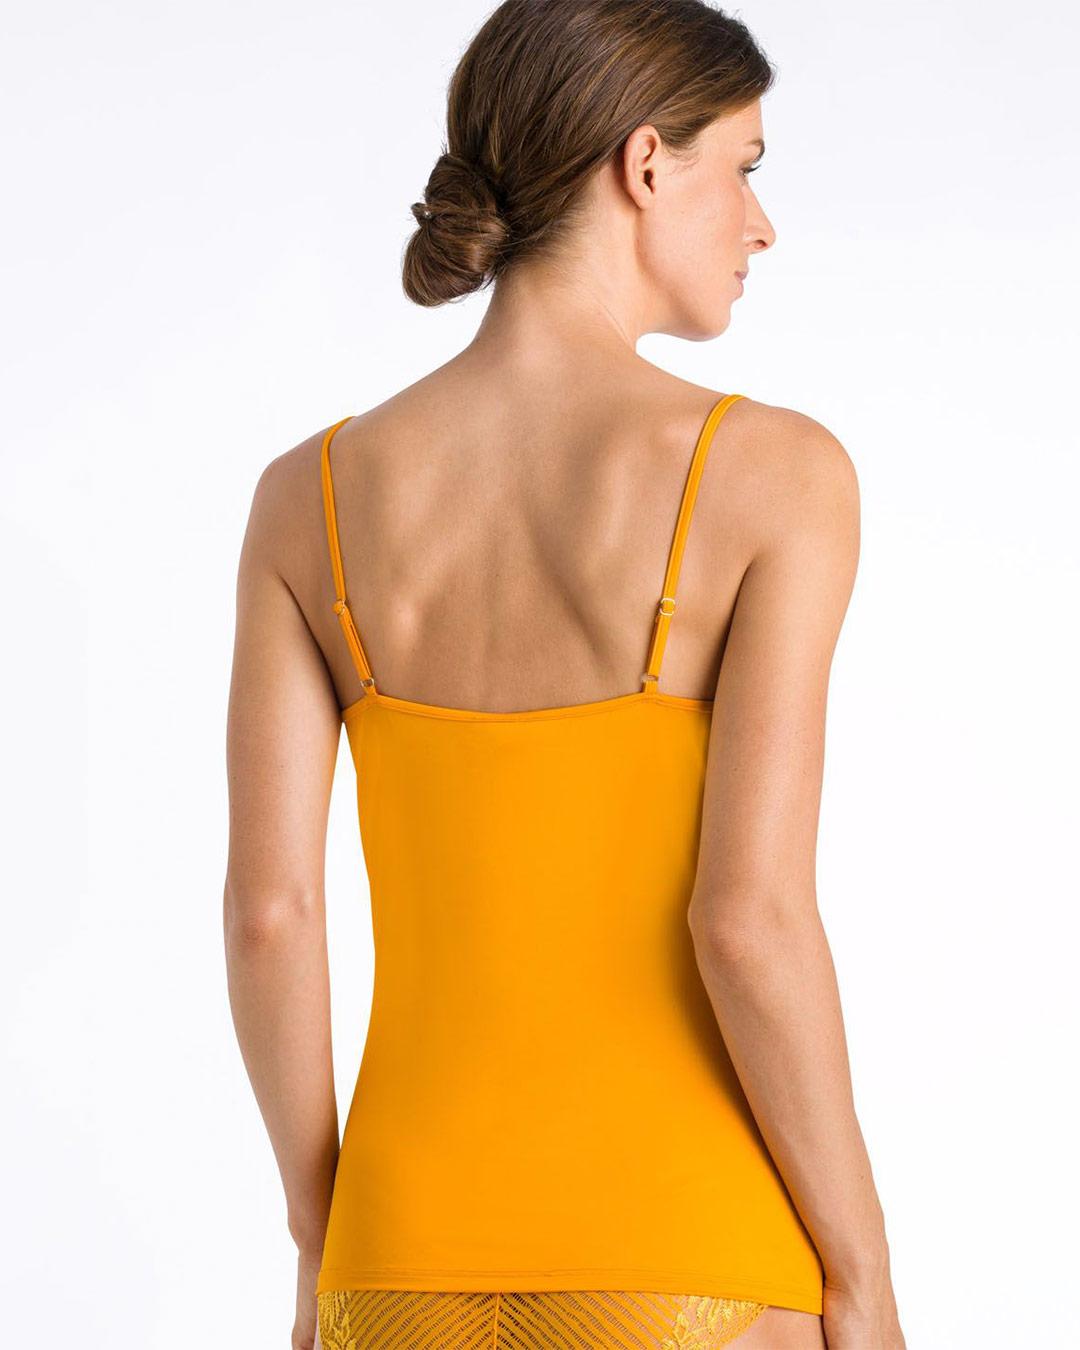 hanro-irini-spaghetti-top-sunny-2933-back-dianes-lingerie-vancouver-1080x1350